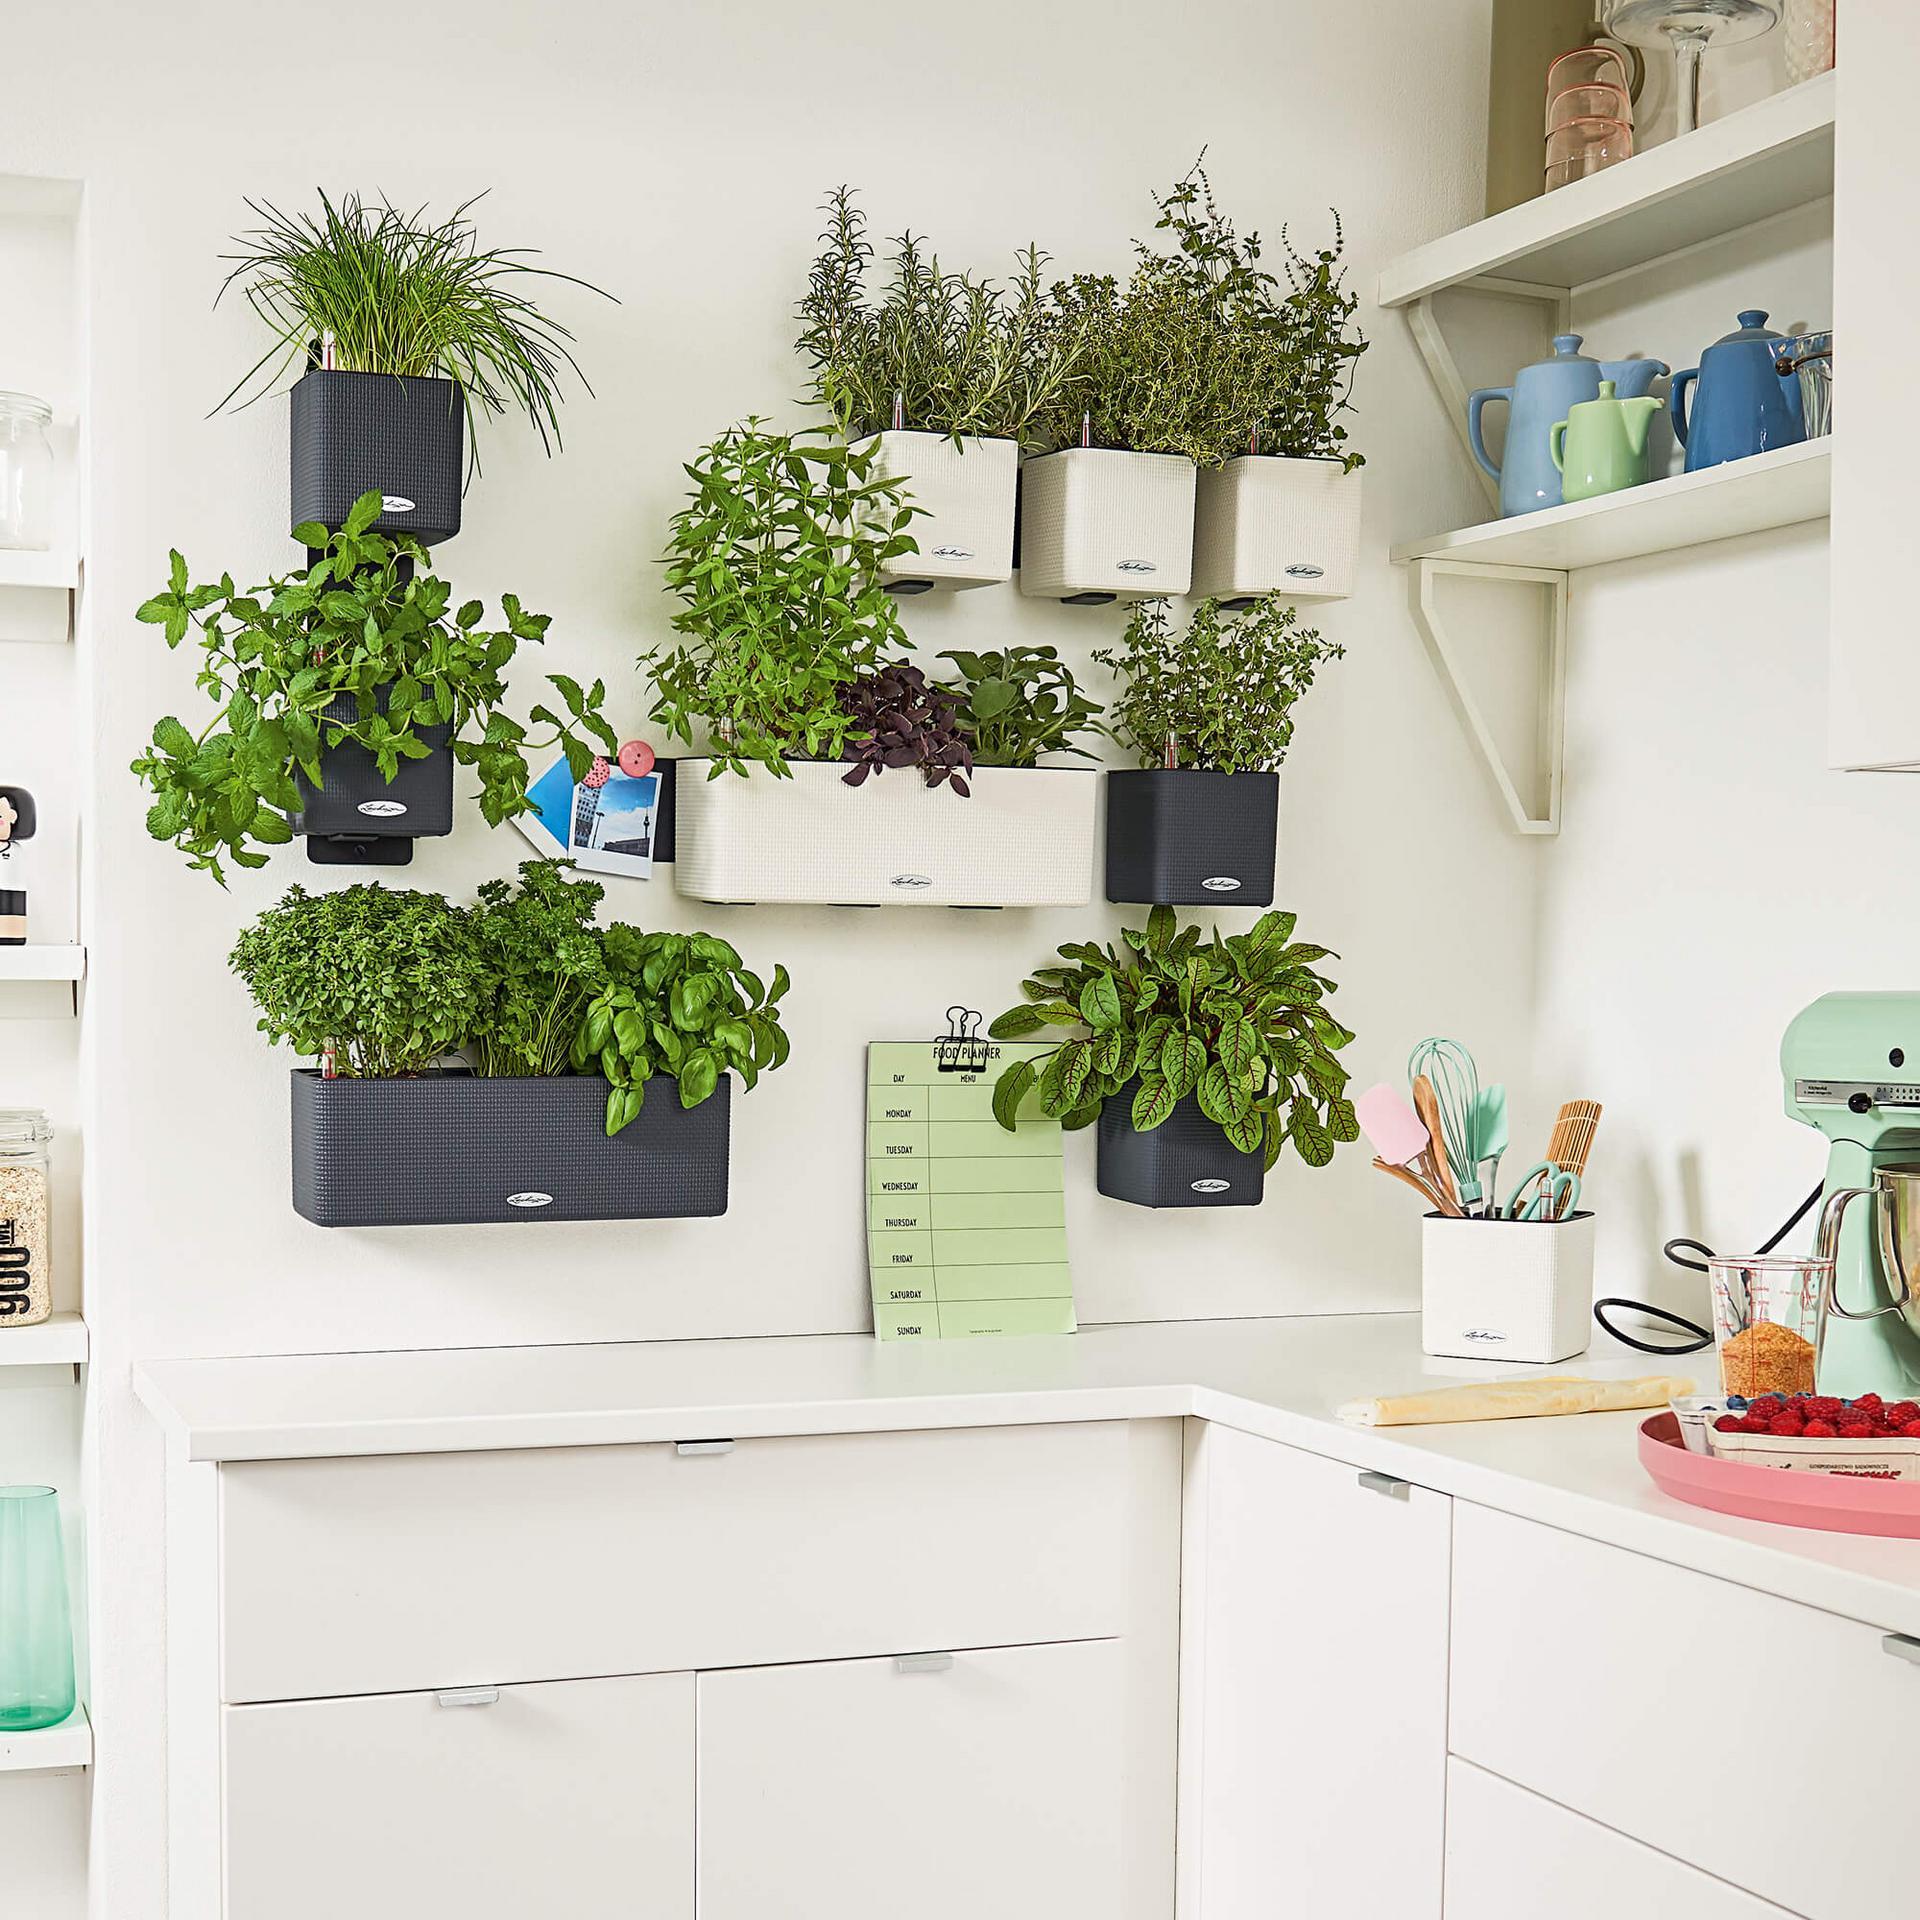 le_green-wall-color_product_addi_02